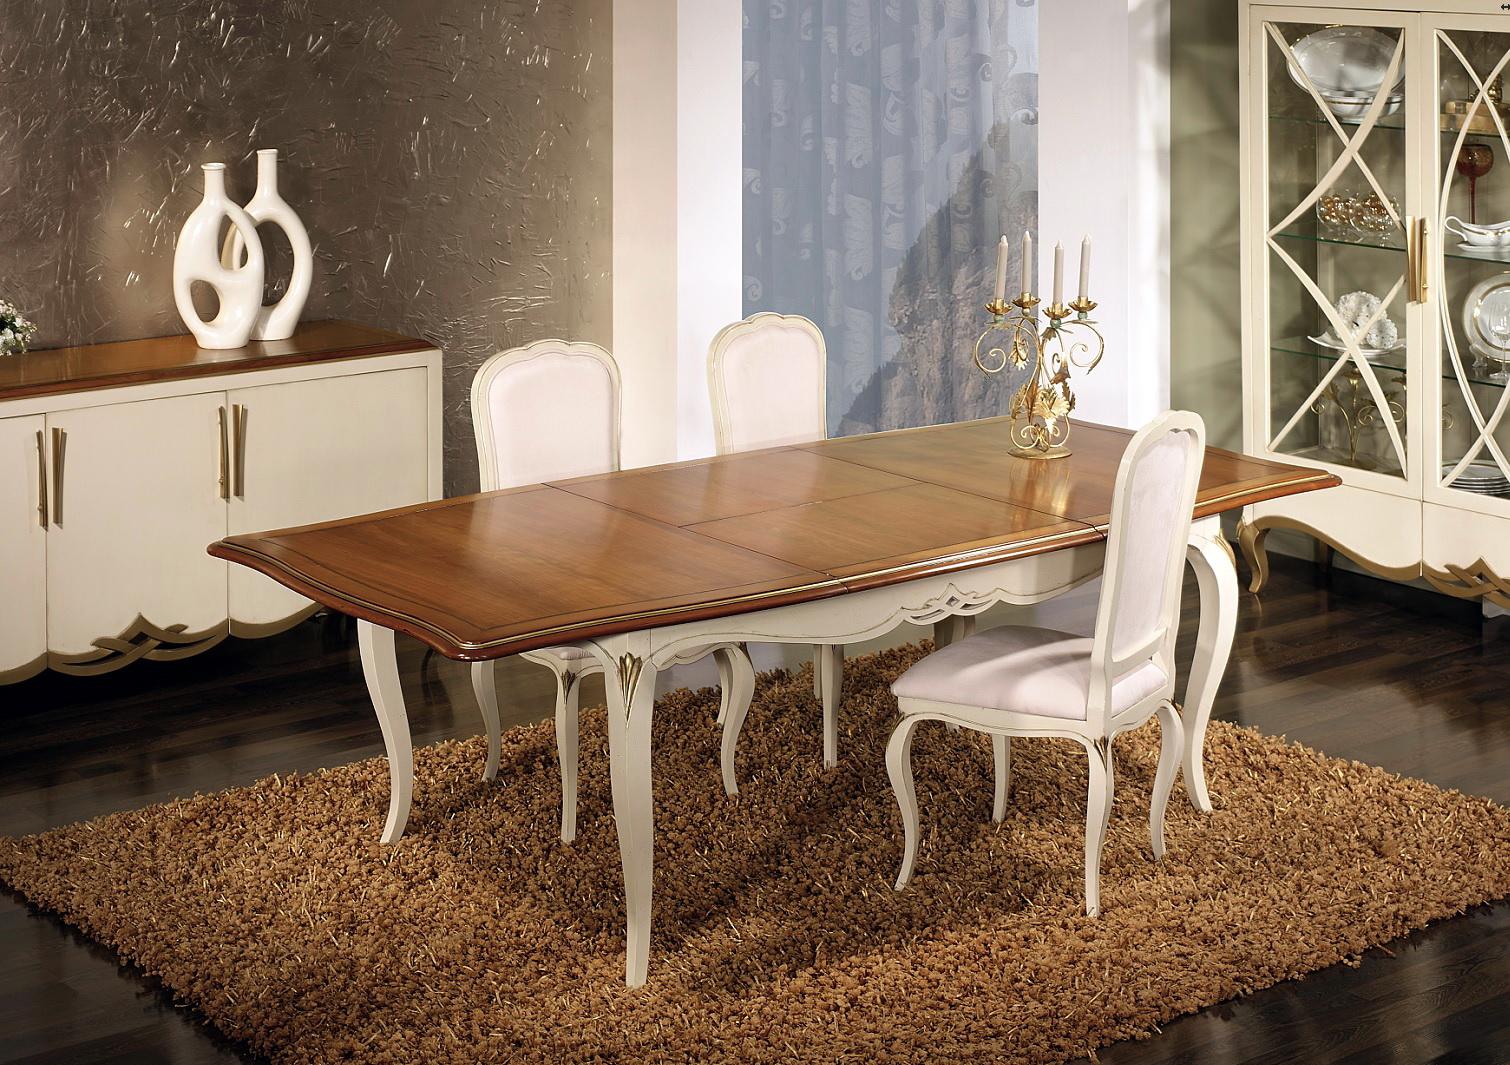 Desir antika sal n franc s muebles anto n for Muebles estilo frances online